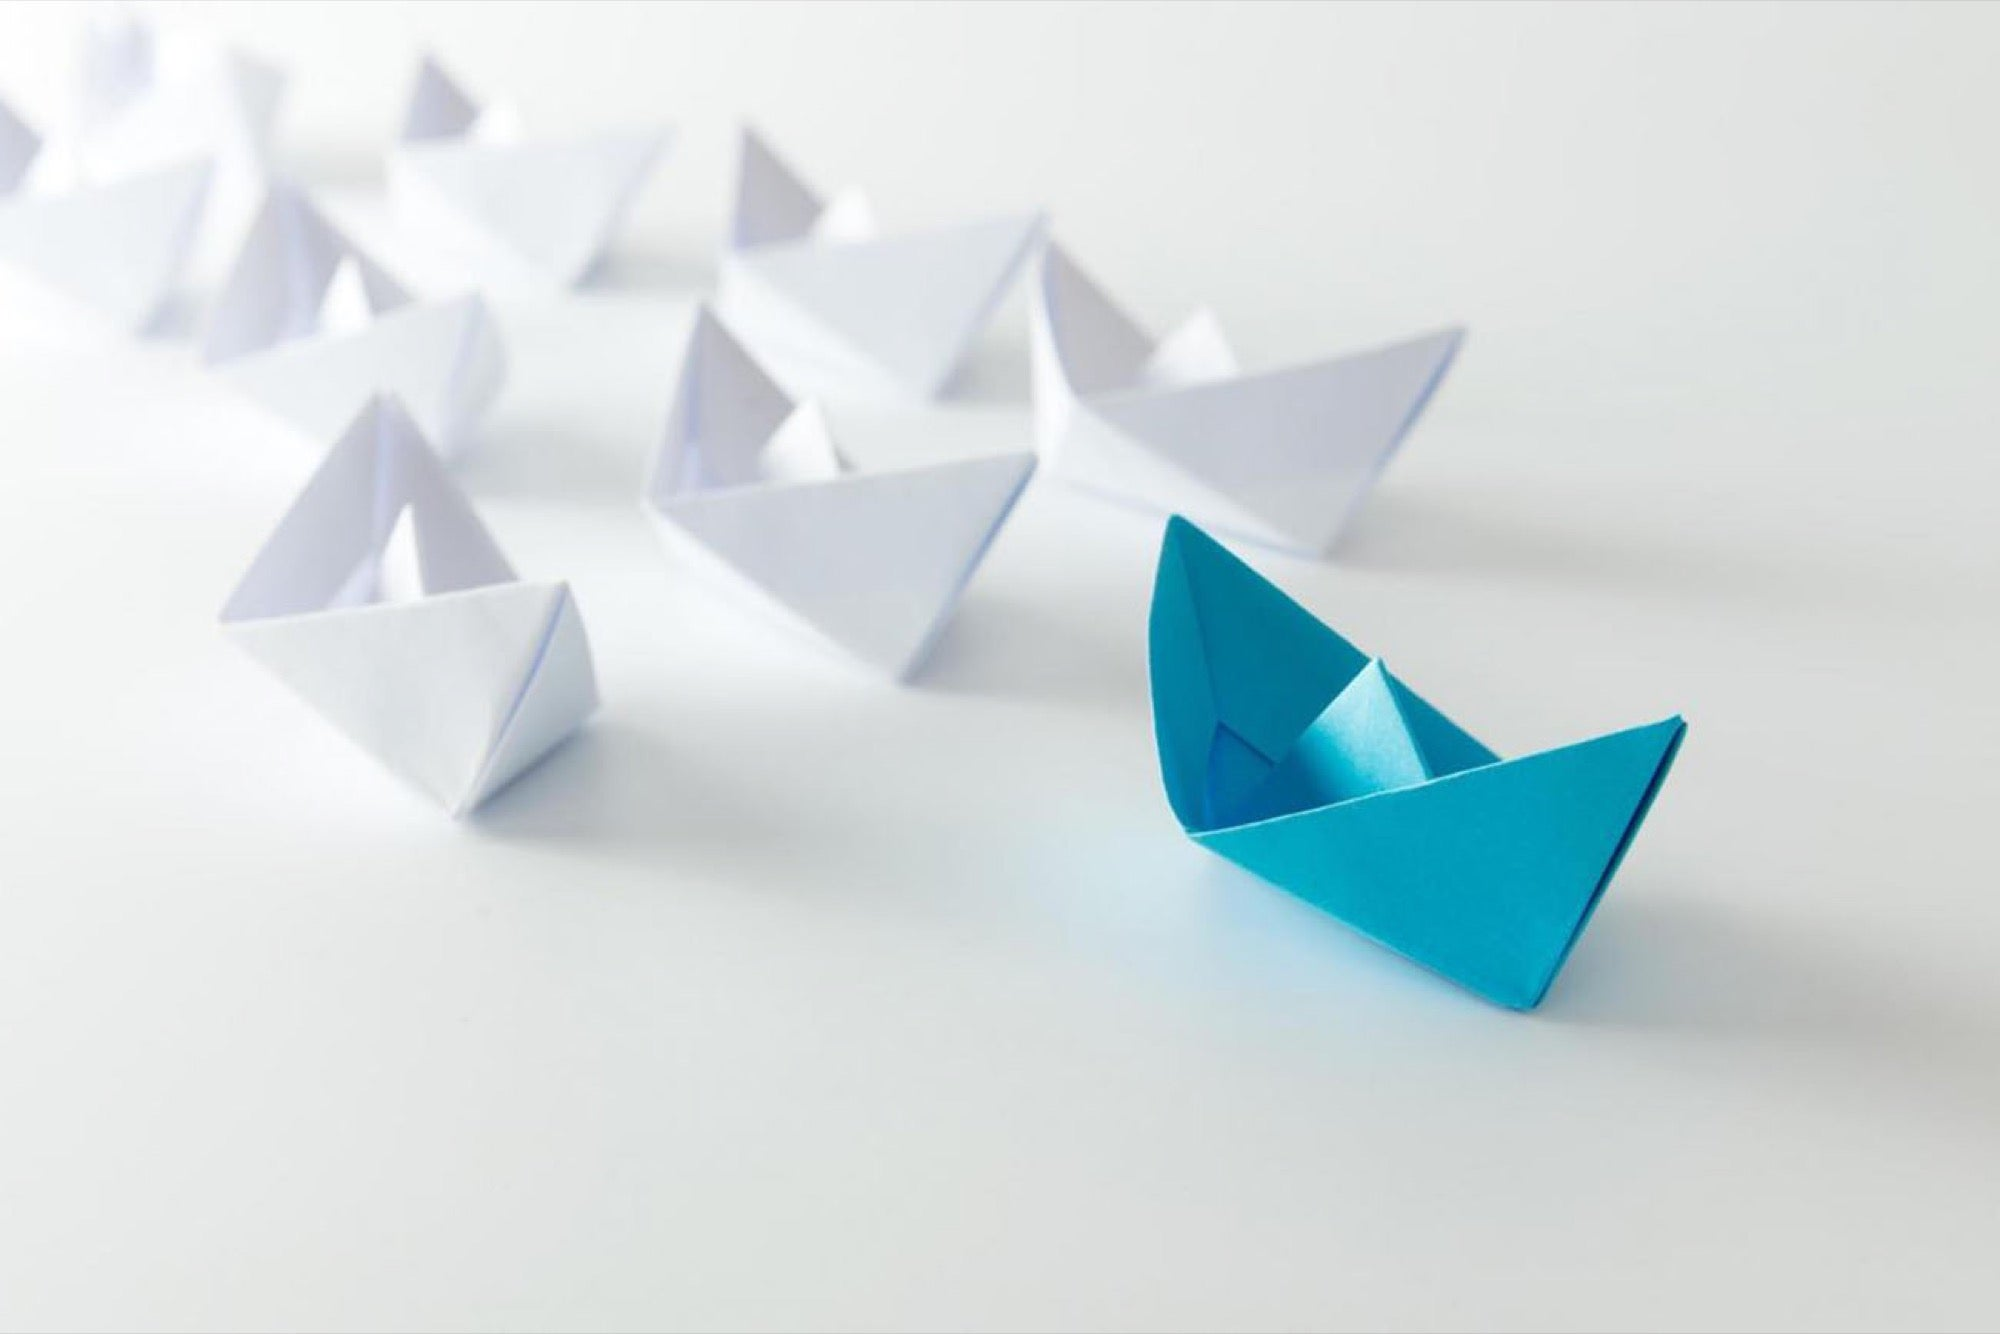 traits of a good leader worth emulating